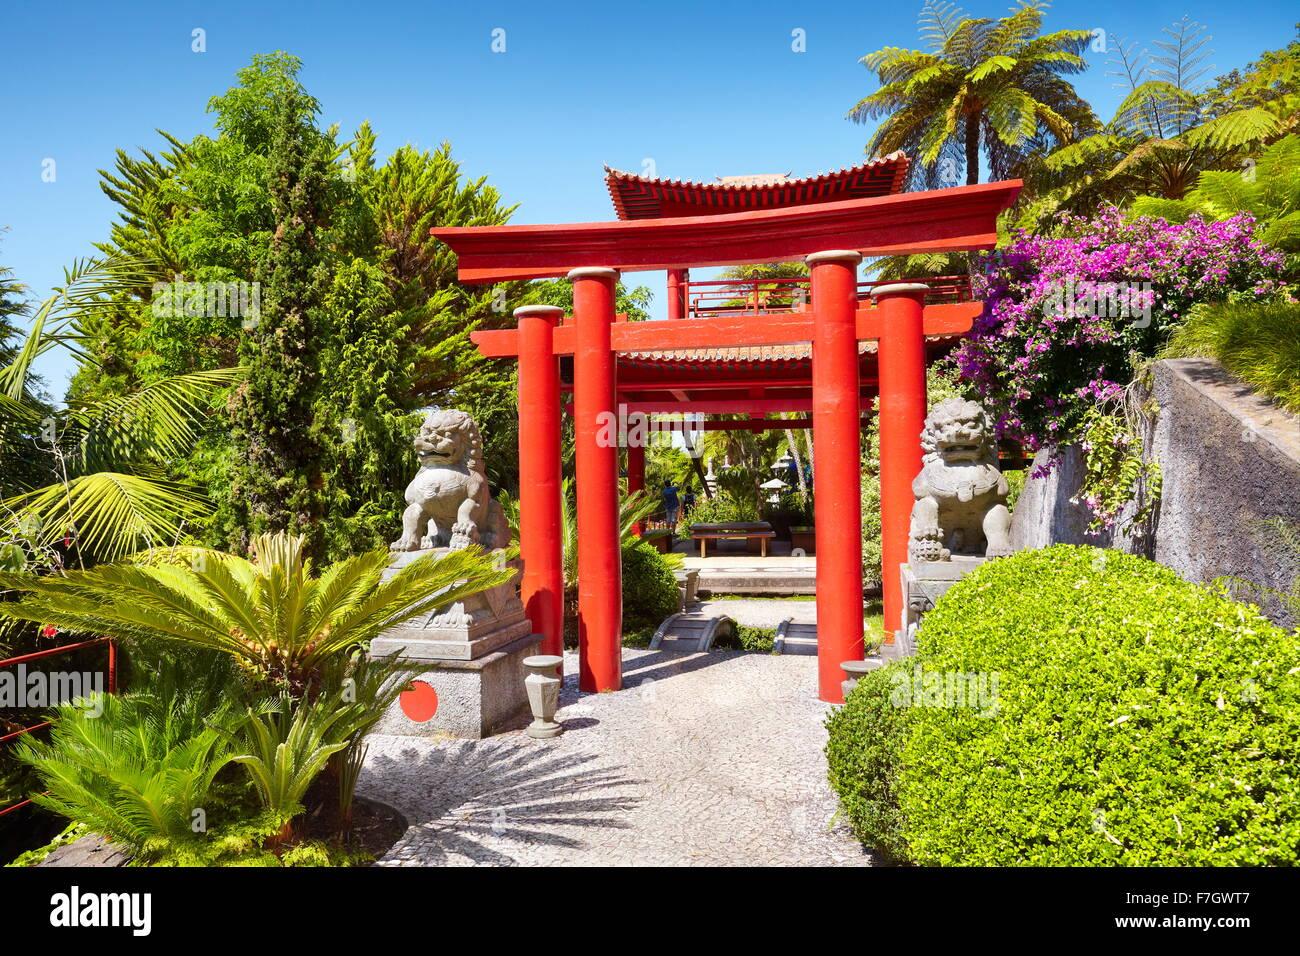 El Jardín Tropical de Monte Palace (jardín japonés) - Monte, la isla de Madeira, Portugal Imagen De Stock